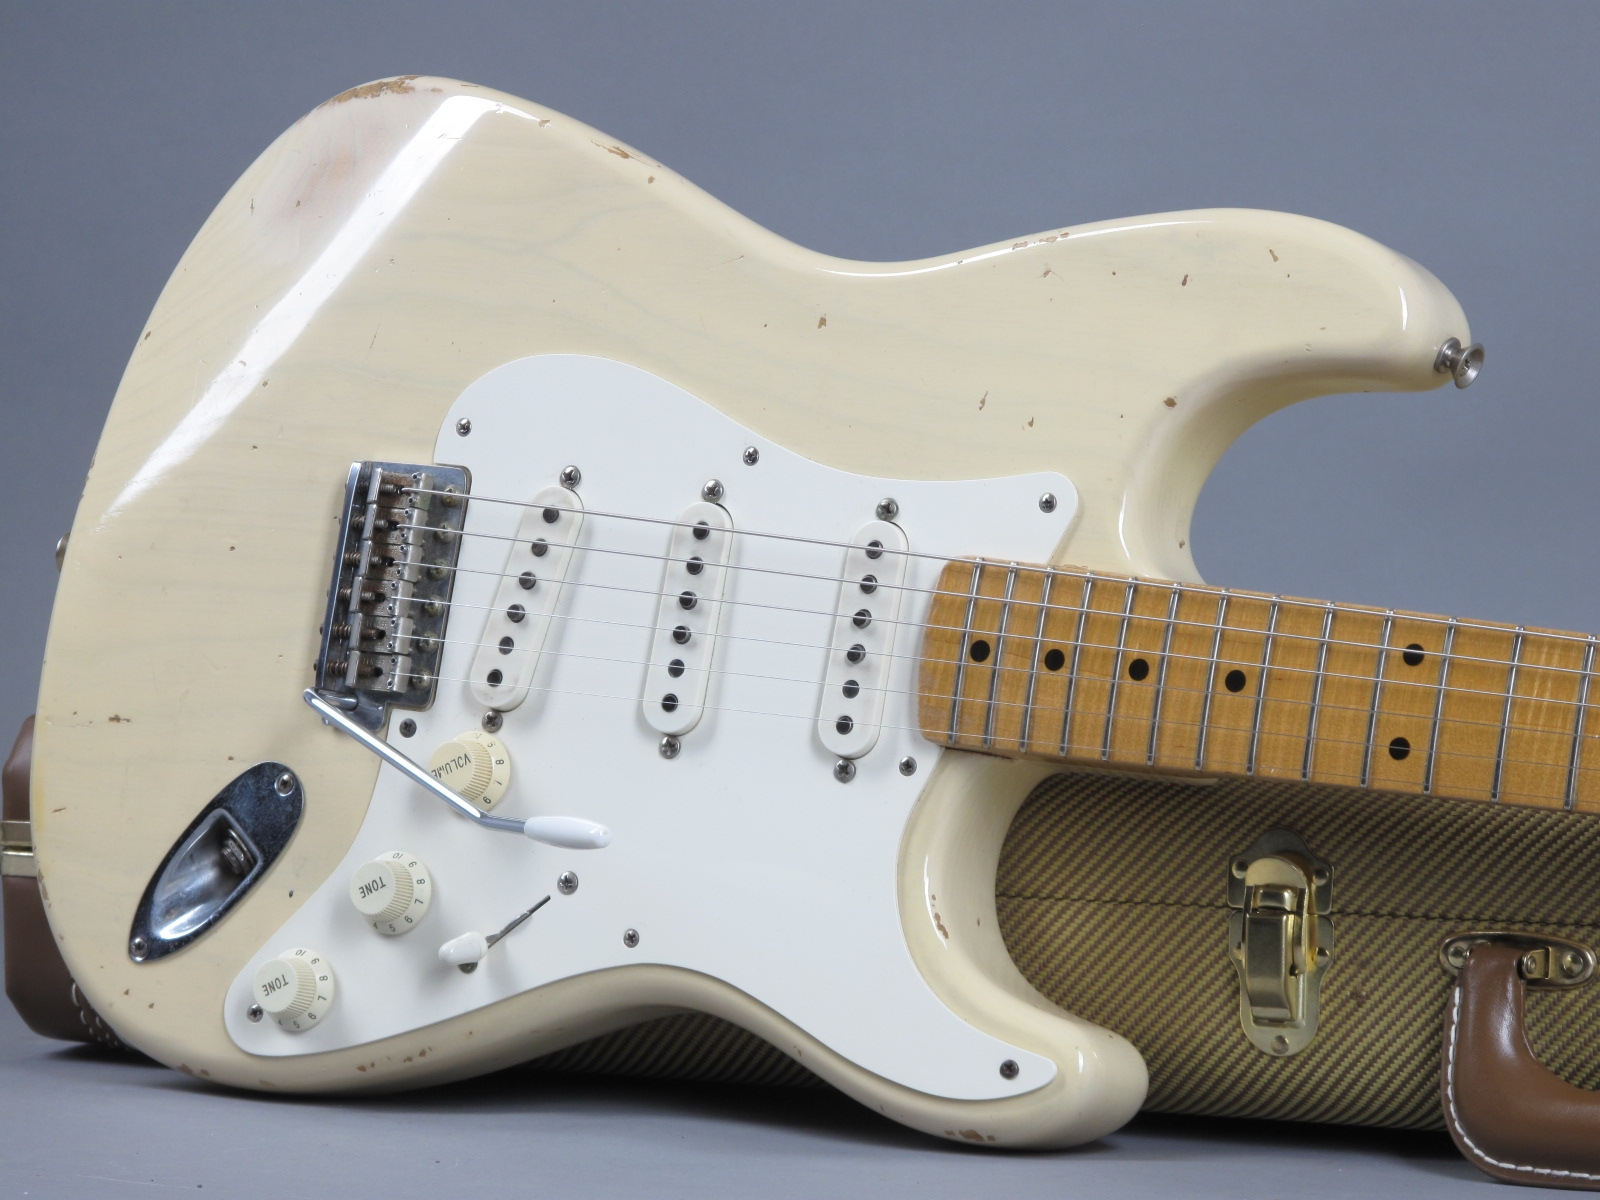 https://guitarpoint.de/app/uploads/products/1997-fender-custom-shop-cunetto-cruz-1956-stratocaster-blond/1997-Fender-Stratocaster-Cunetto-Blond-R2206-19.jpg